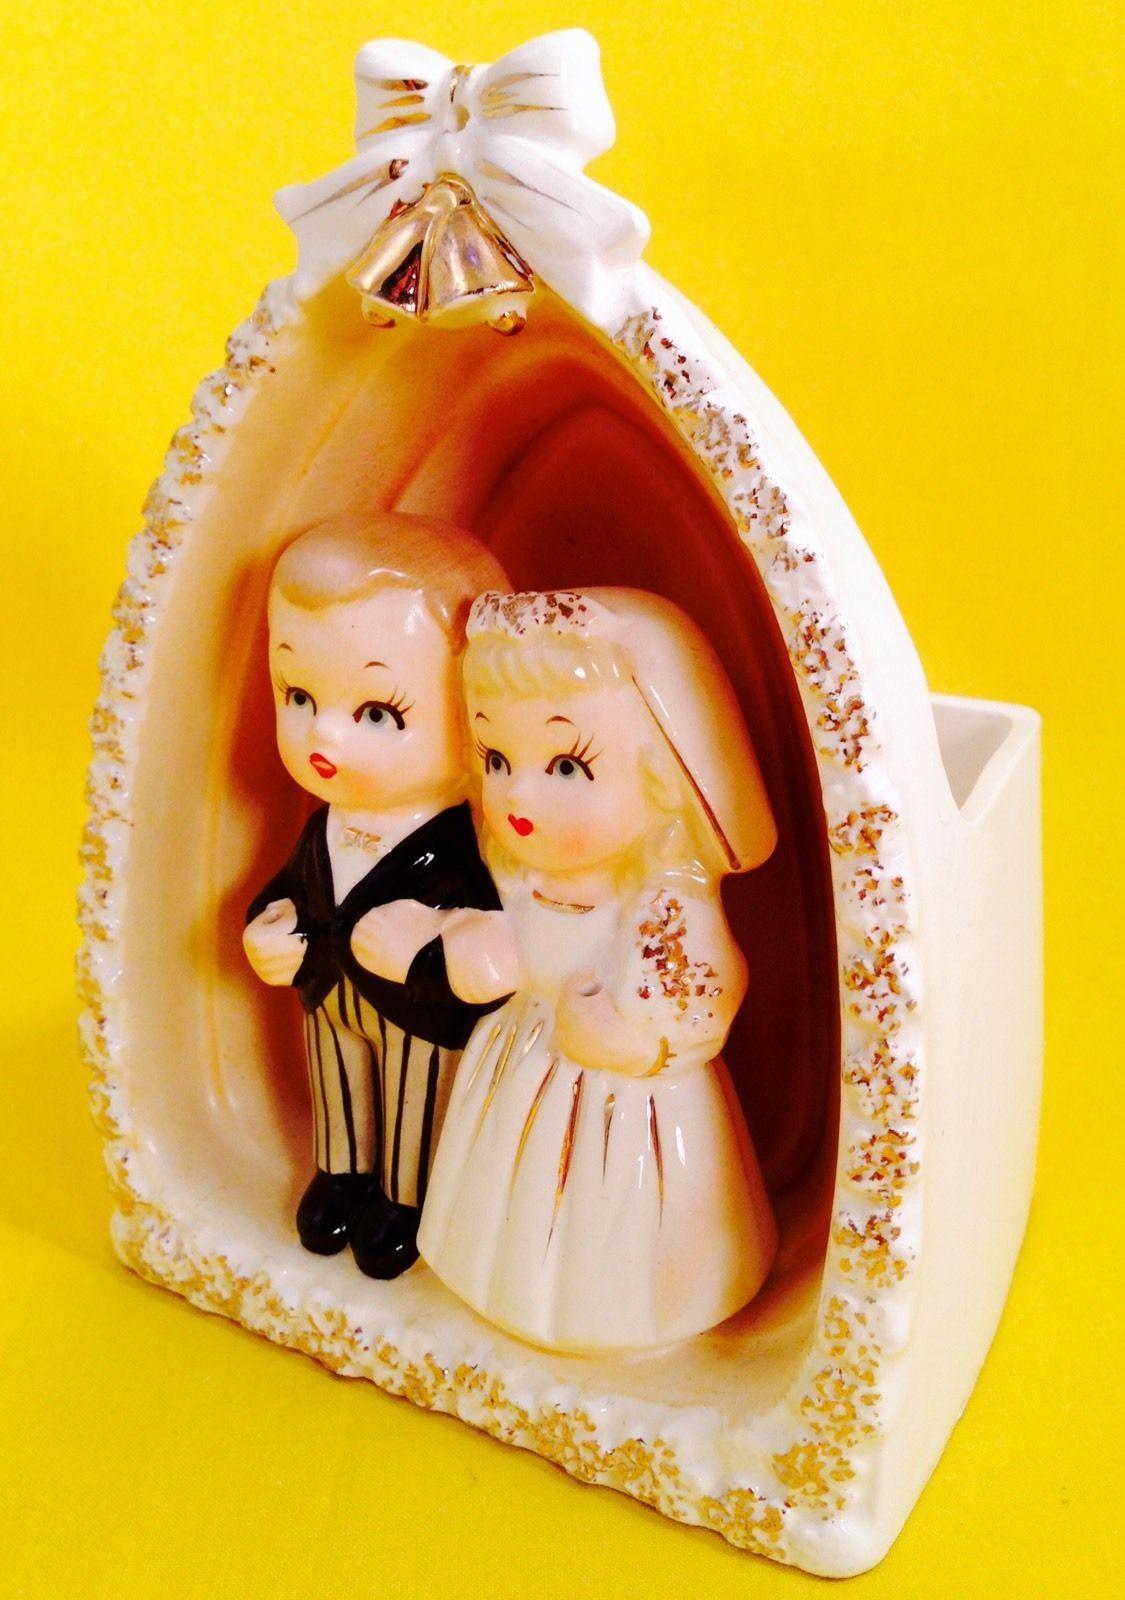 Bride & Groom Wedding Napco Figurine Vintage Planter Cake Topper Retro 1950s